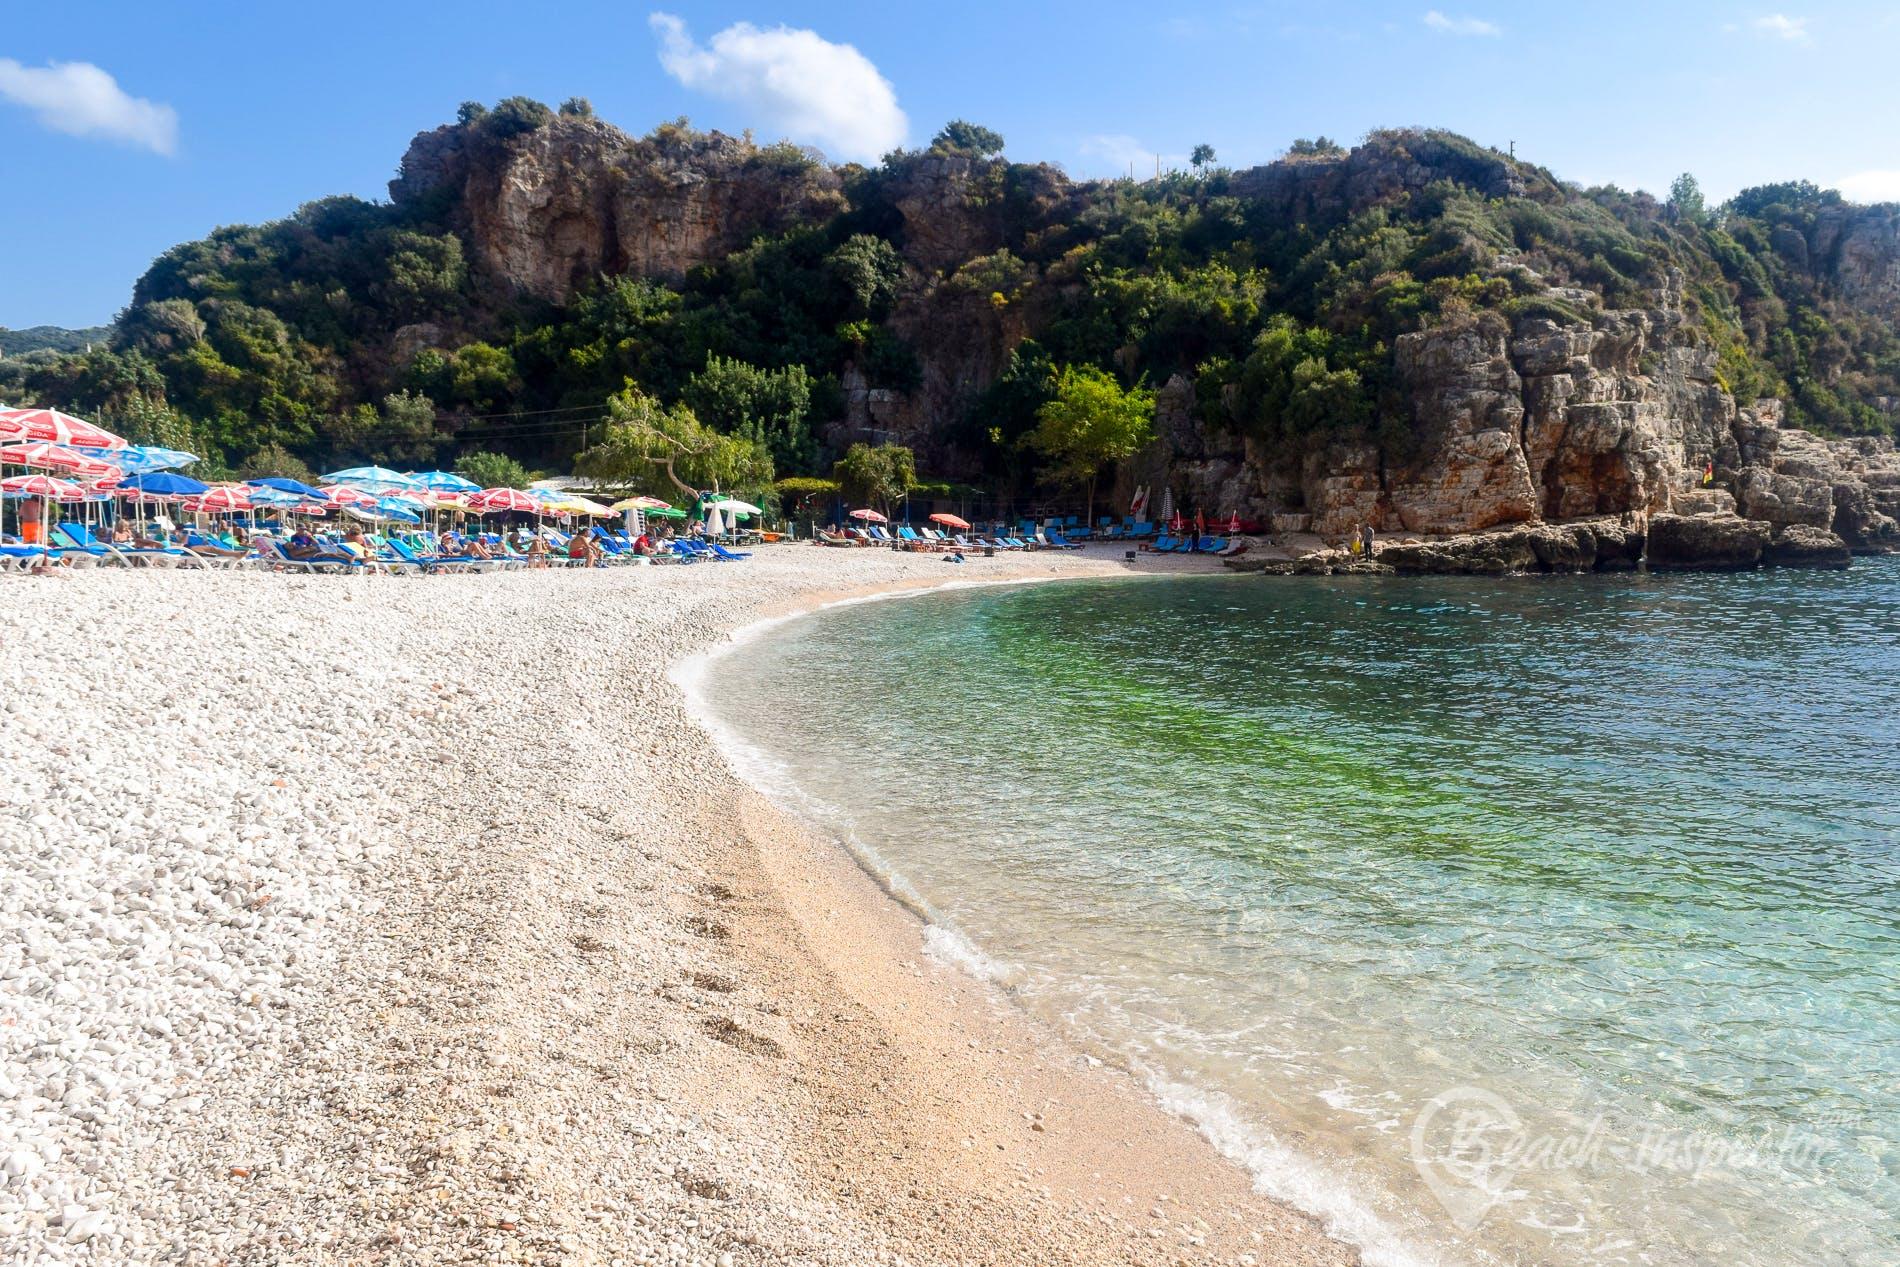 Playa Big Pebble Beach, Riviera Turca, Turquía